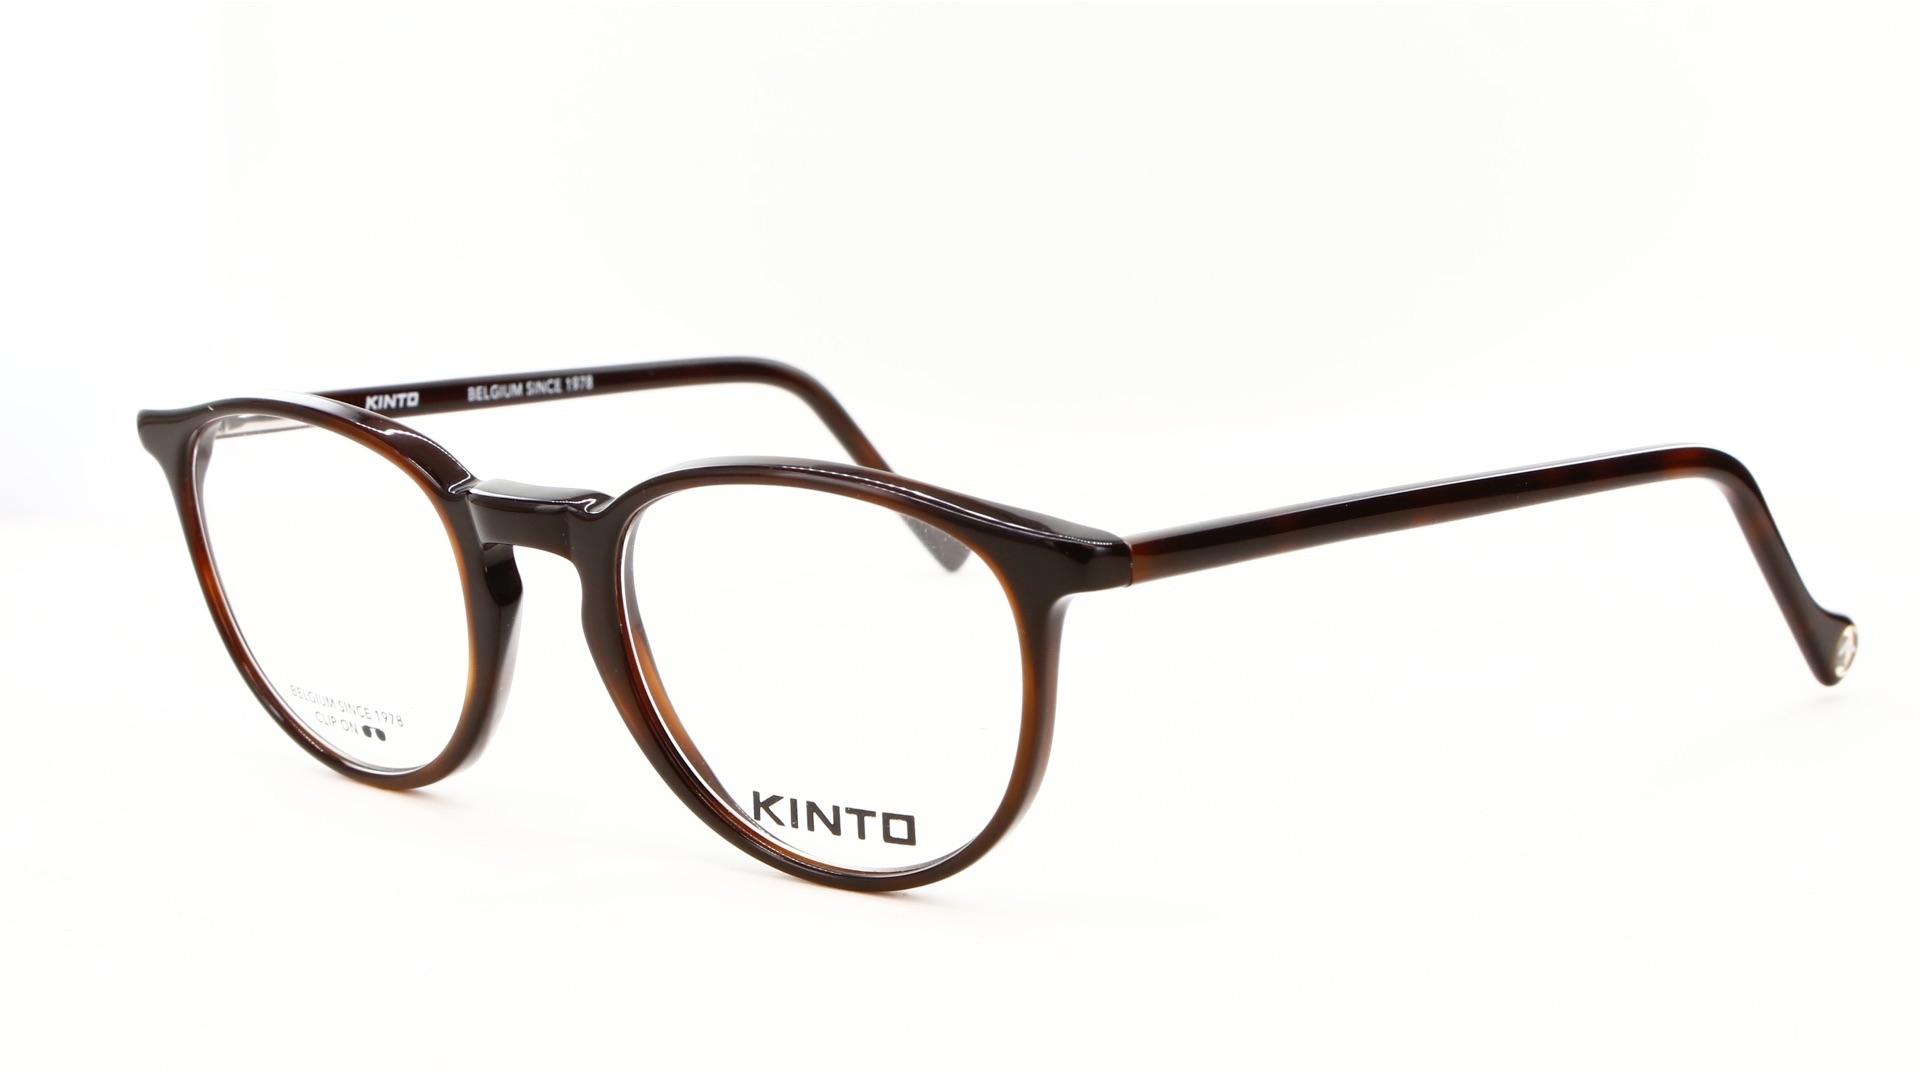 Kinto - ref: 80658